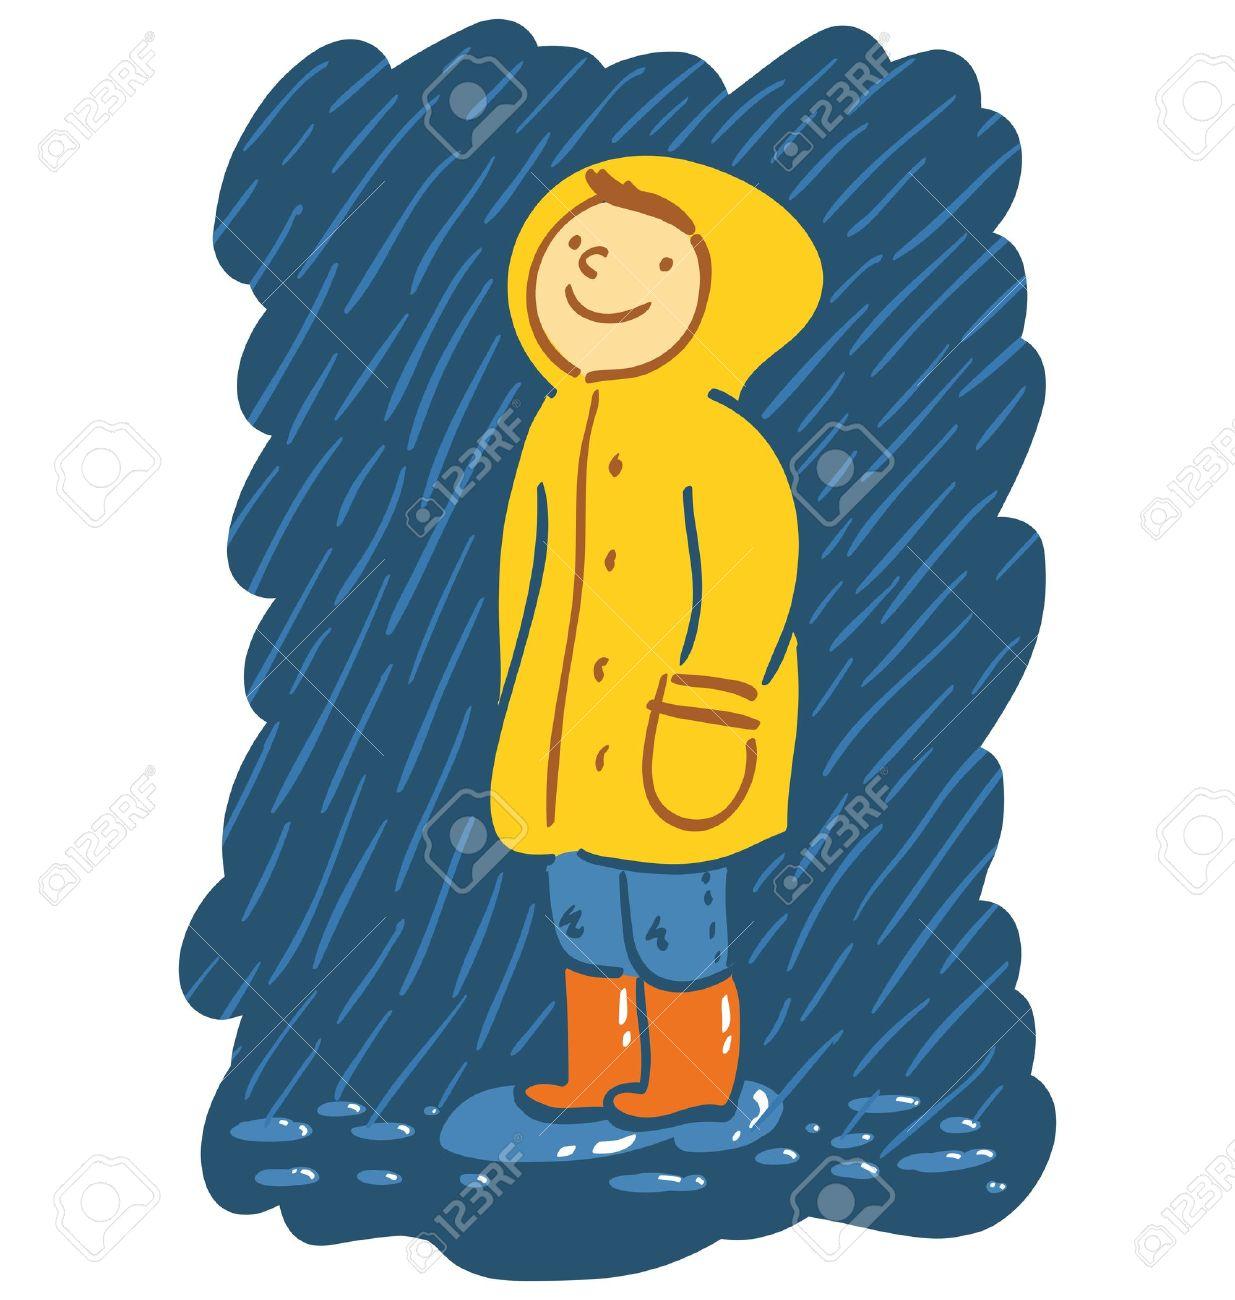 Kids raincoat clipart.